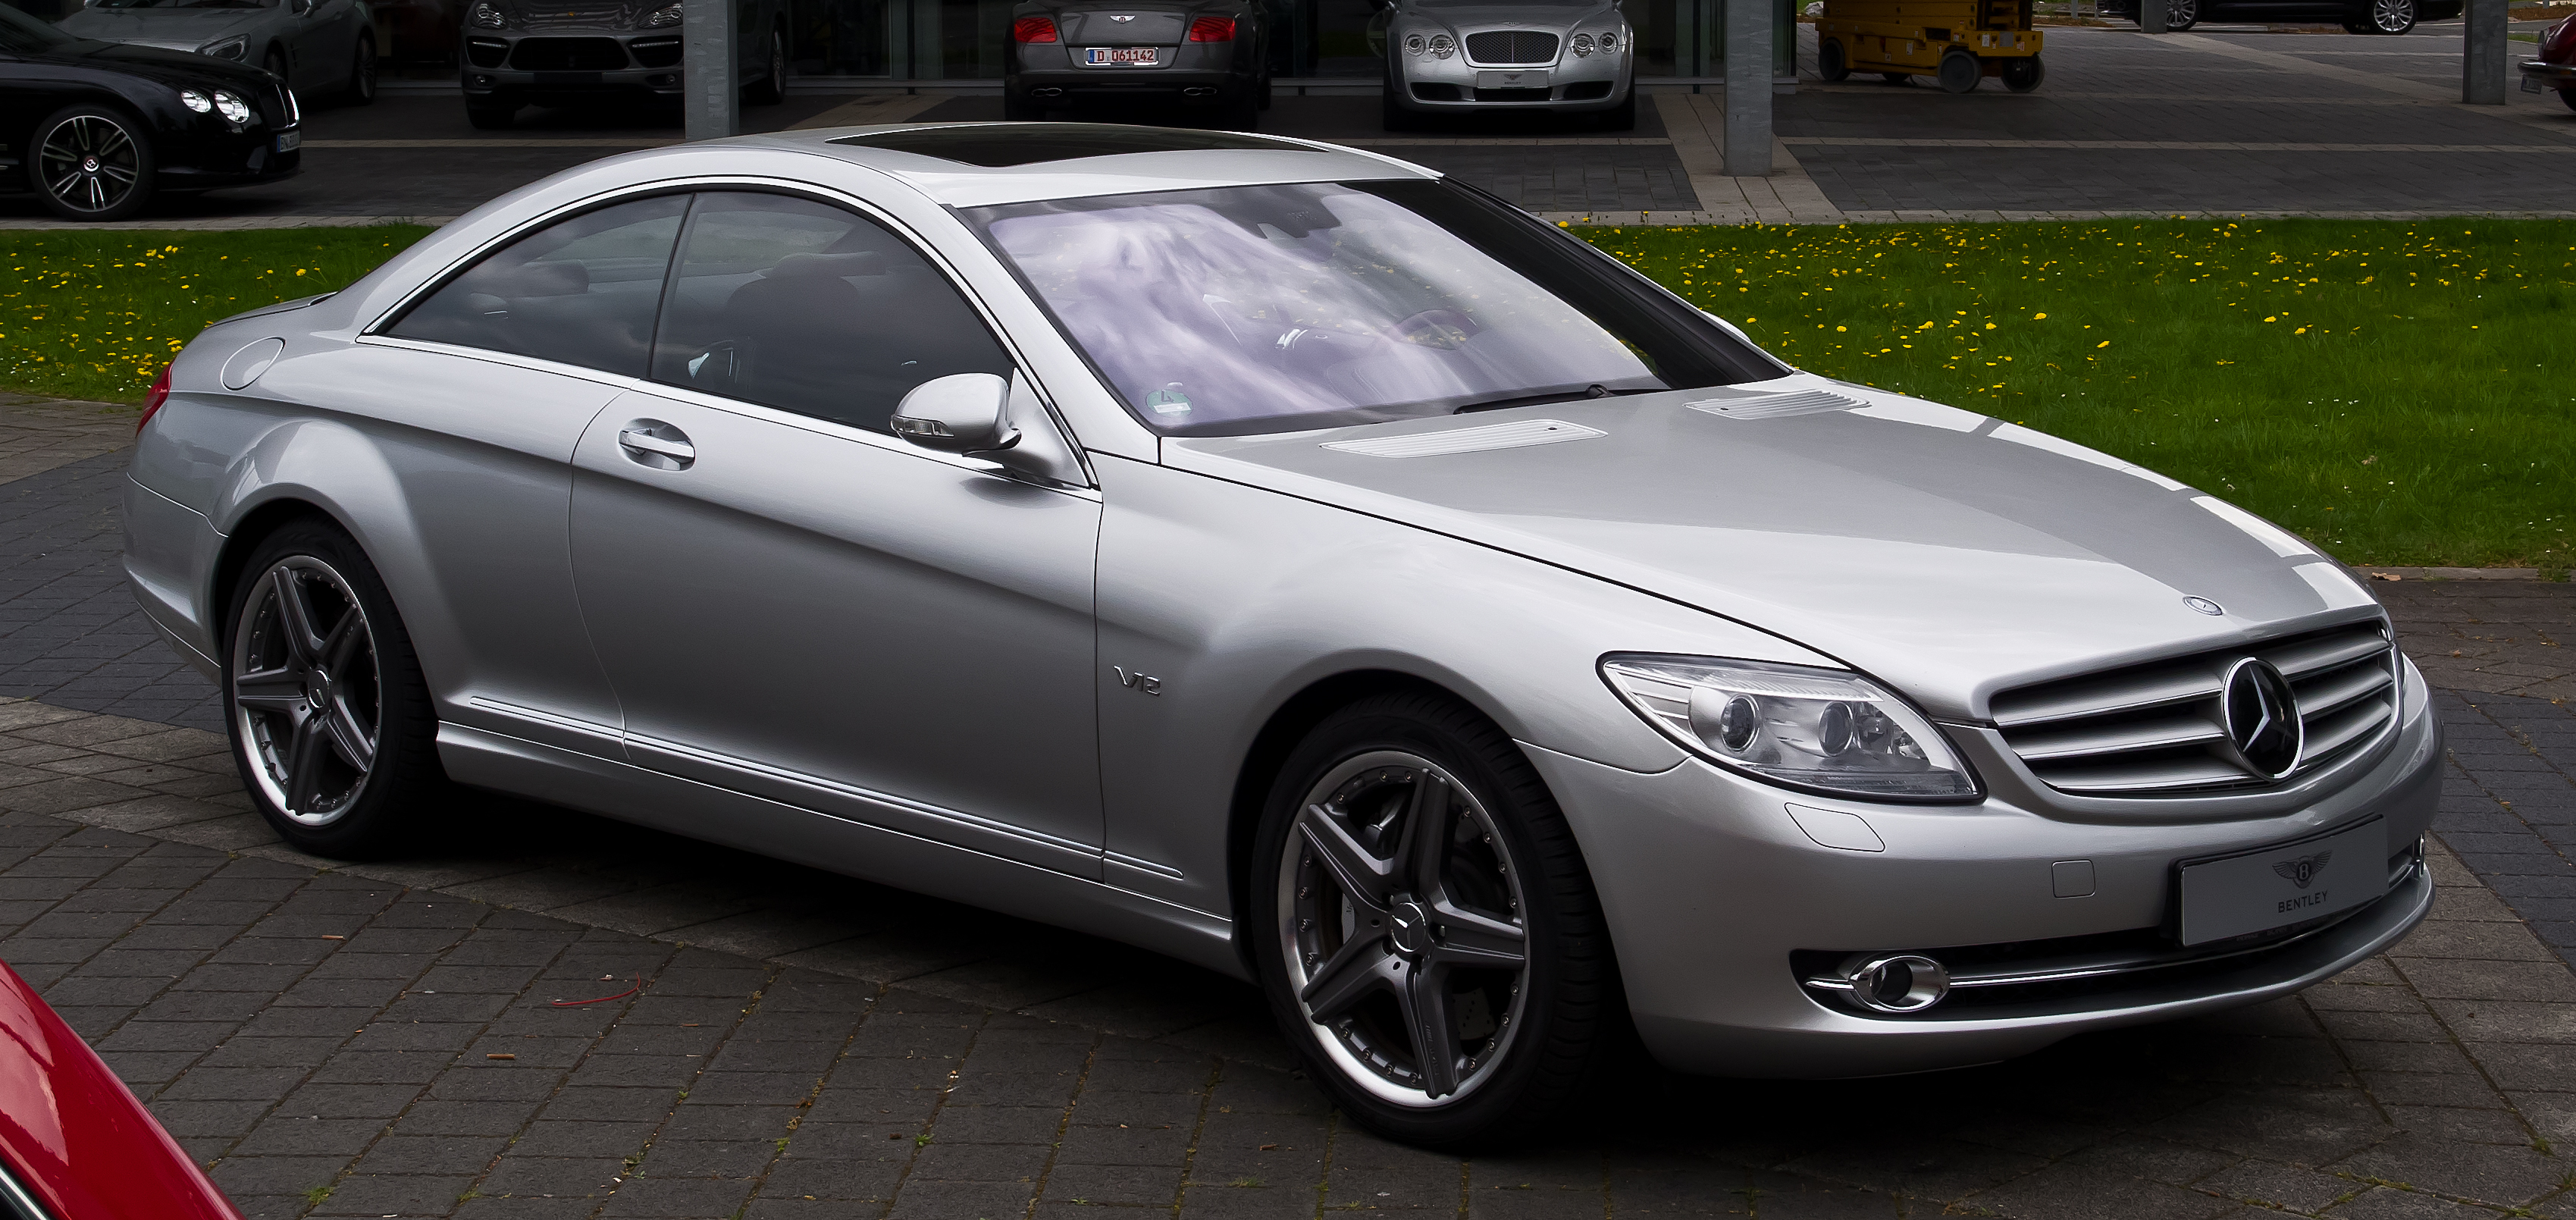 File:Mercedes-Benz CL 600 (C 216)